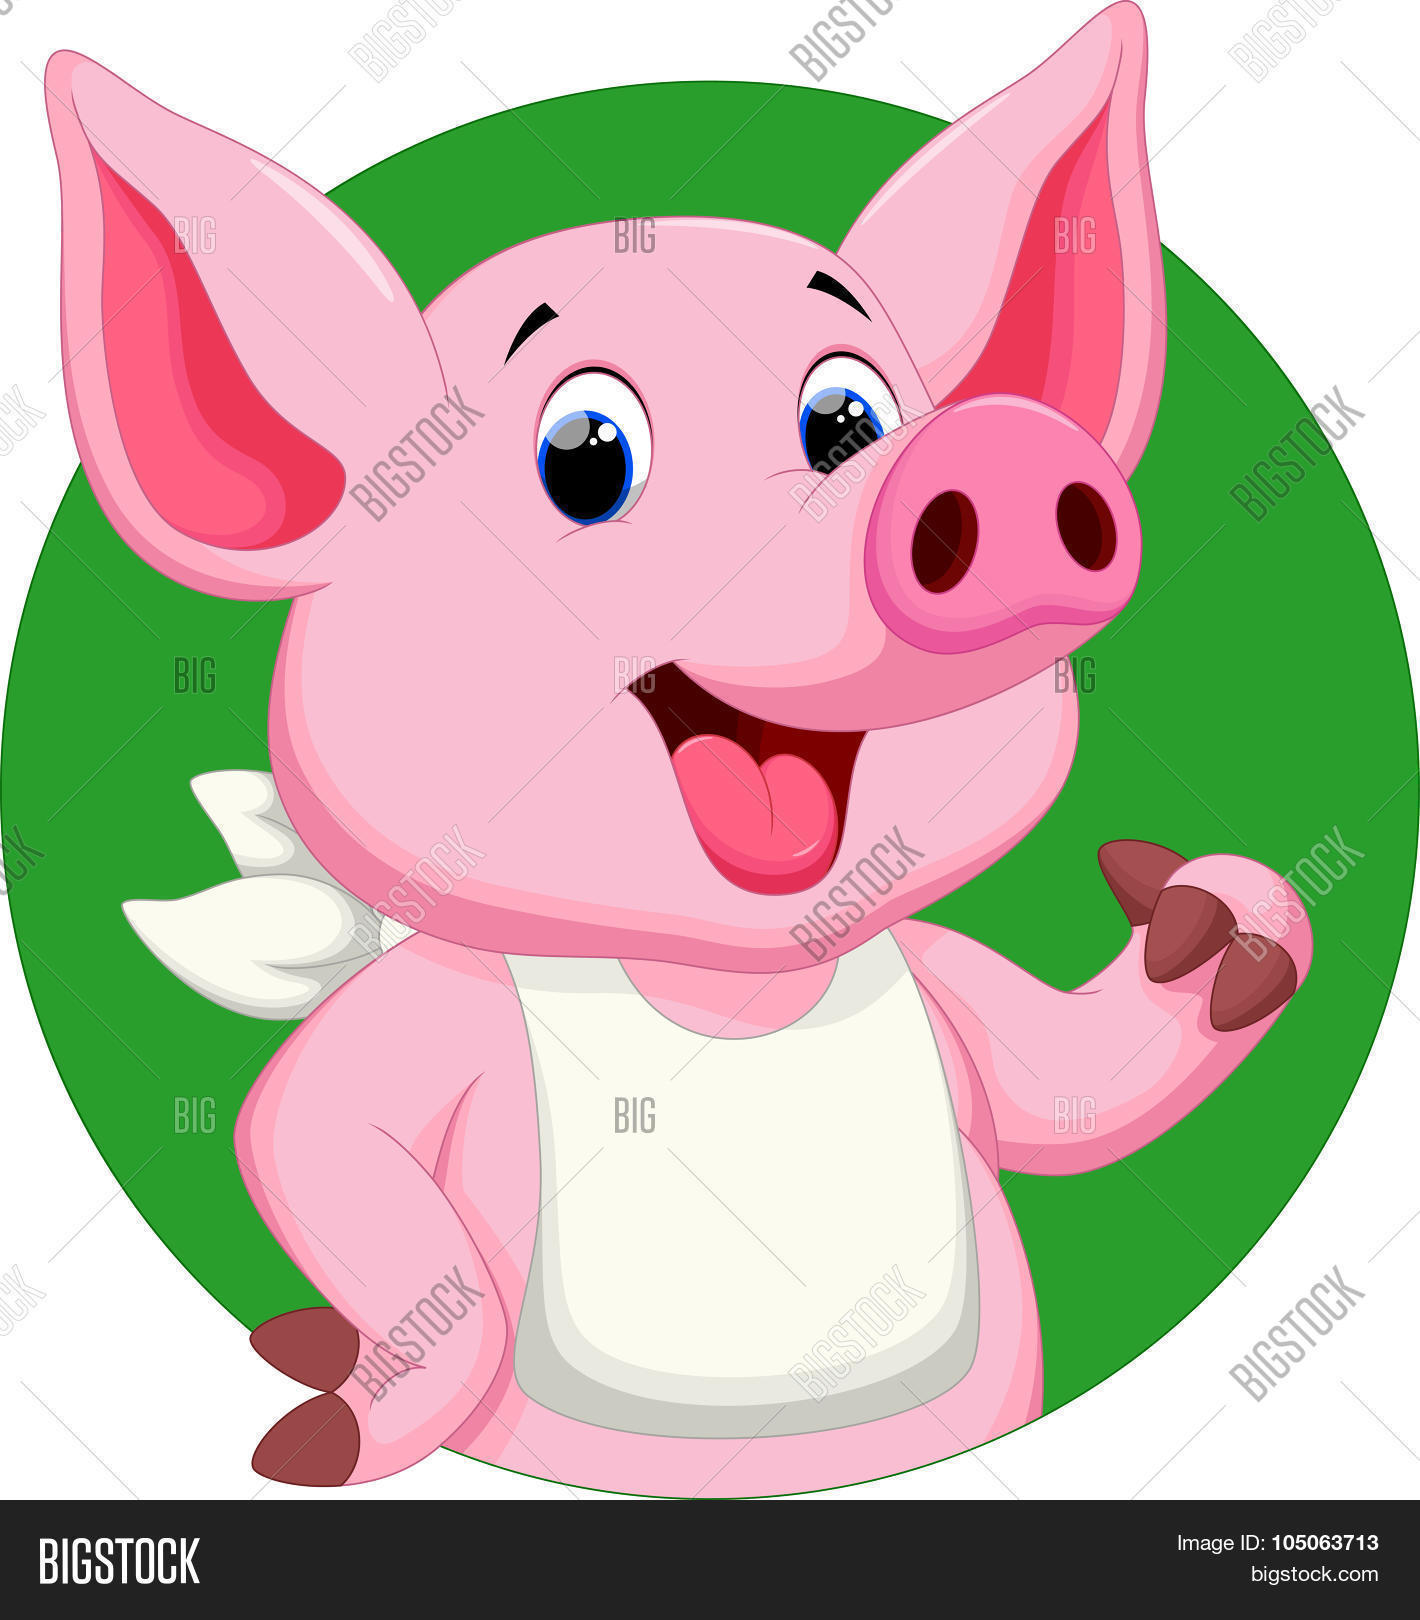 1420x1620 Cute Pig Thumbs Cartoon Vector Amp Photo Bigstock